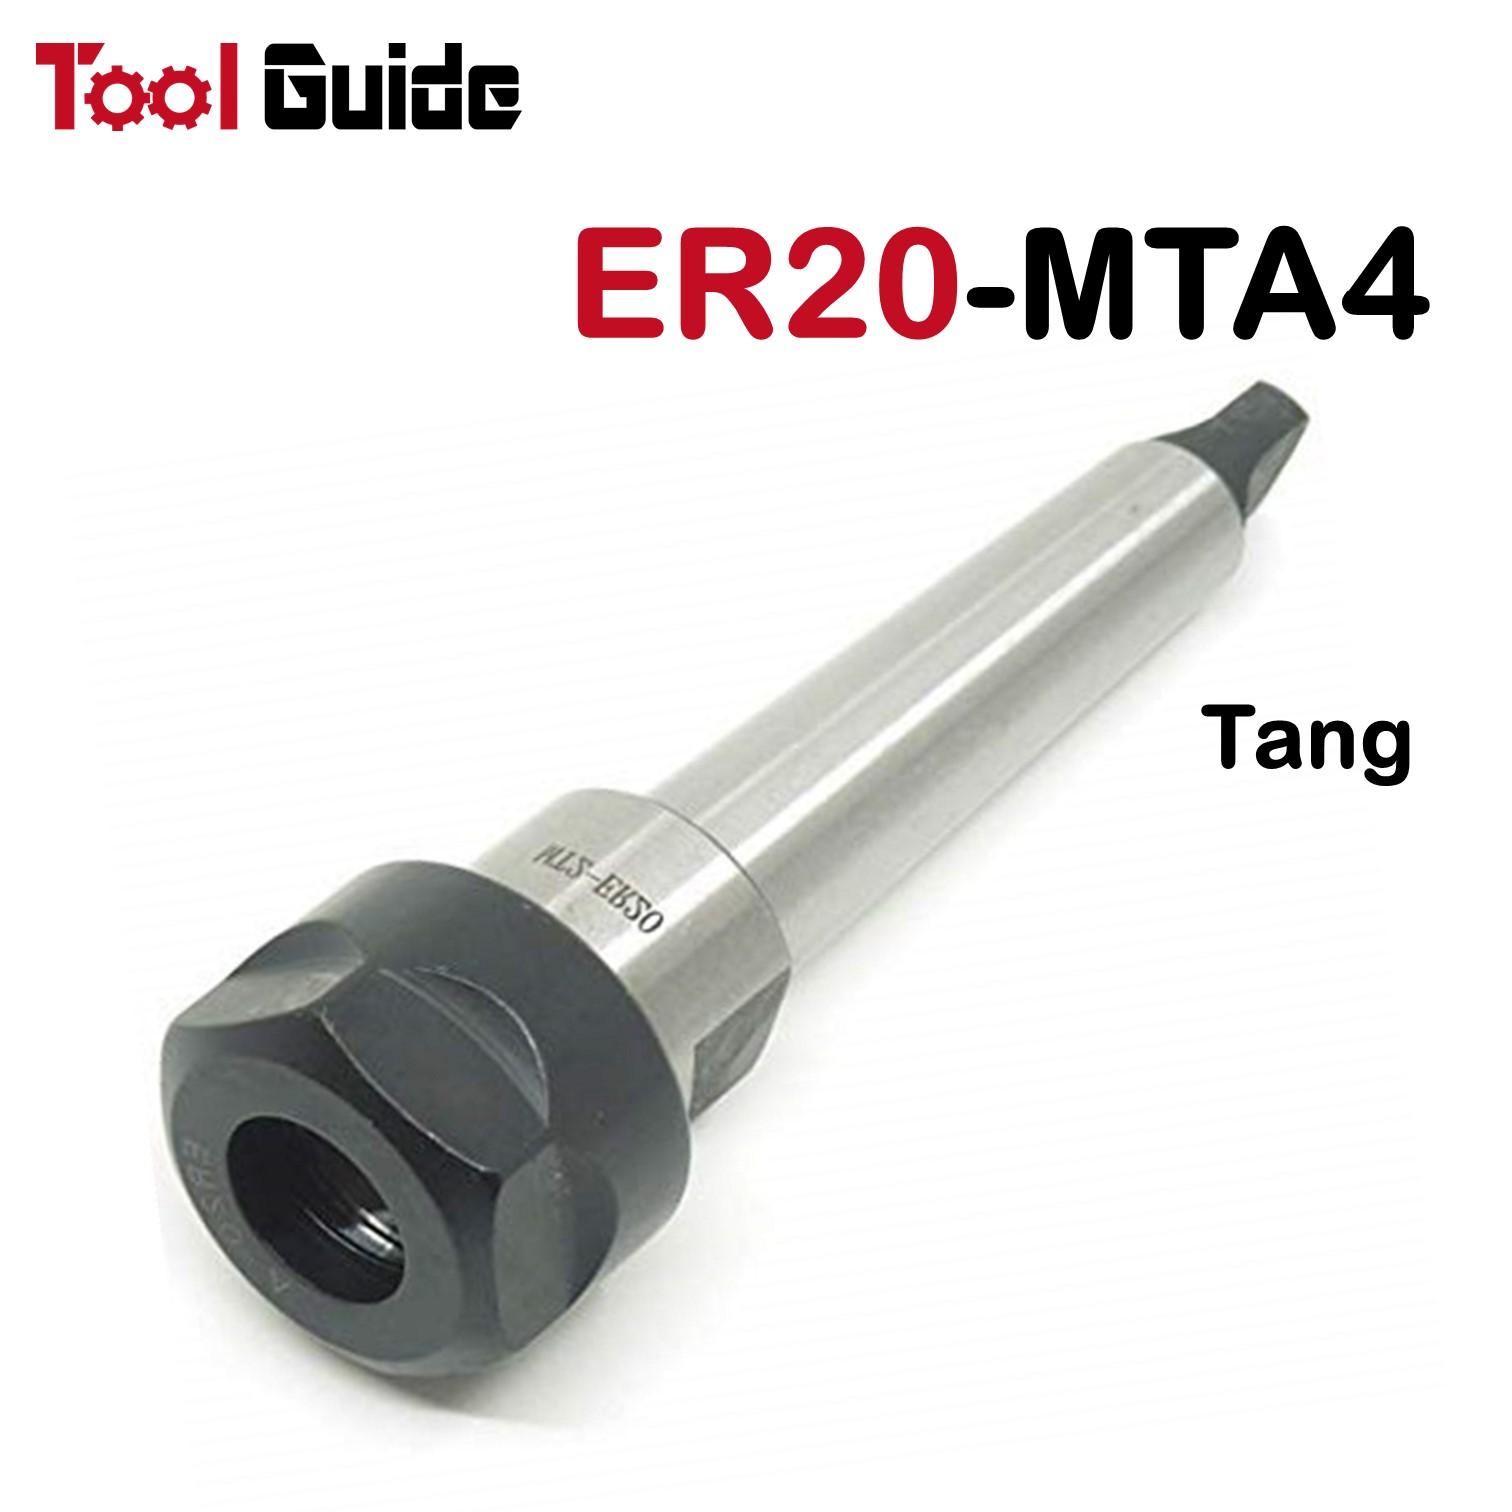 ER20 Collet Chuck 20mm x200mm Straight Shank Extension Milling Holder Deep Drill